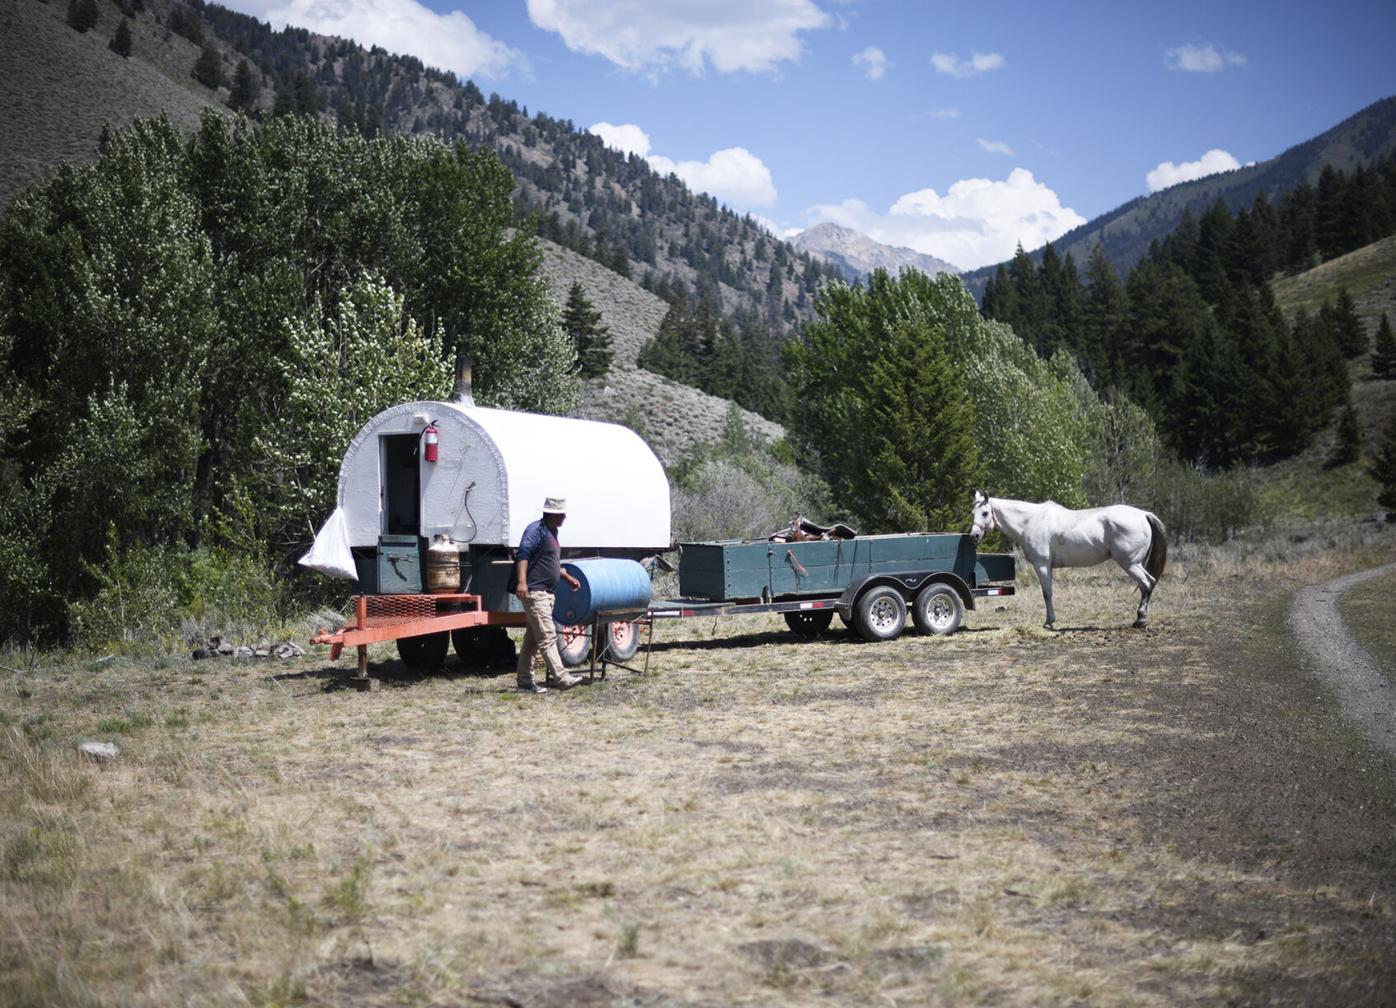 20-08-05  Sheep Herder Trail Creek 1 Roland WF.jpg